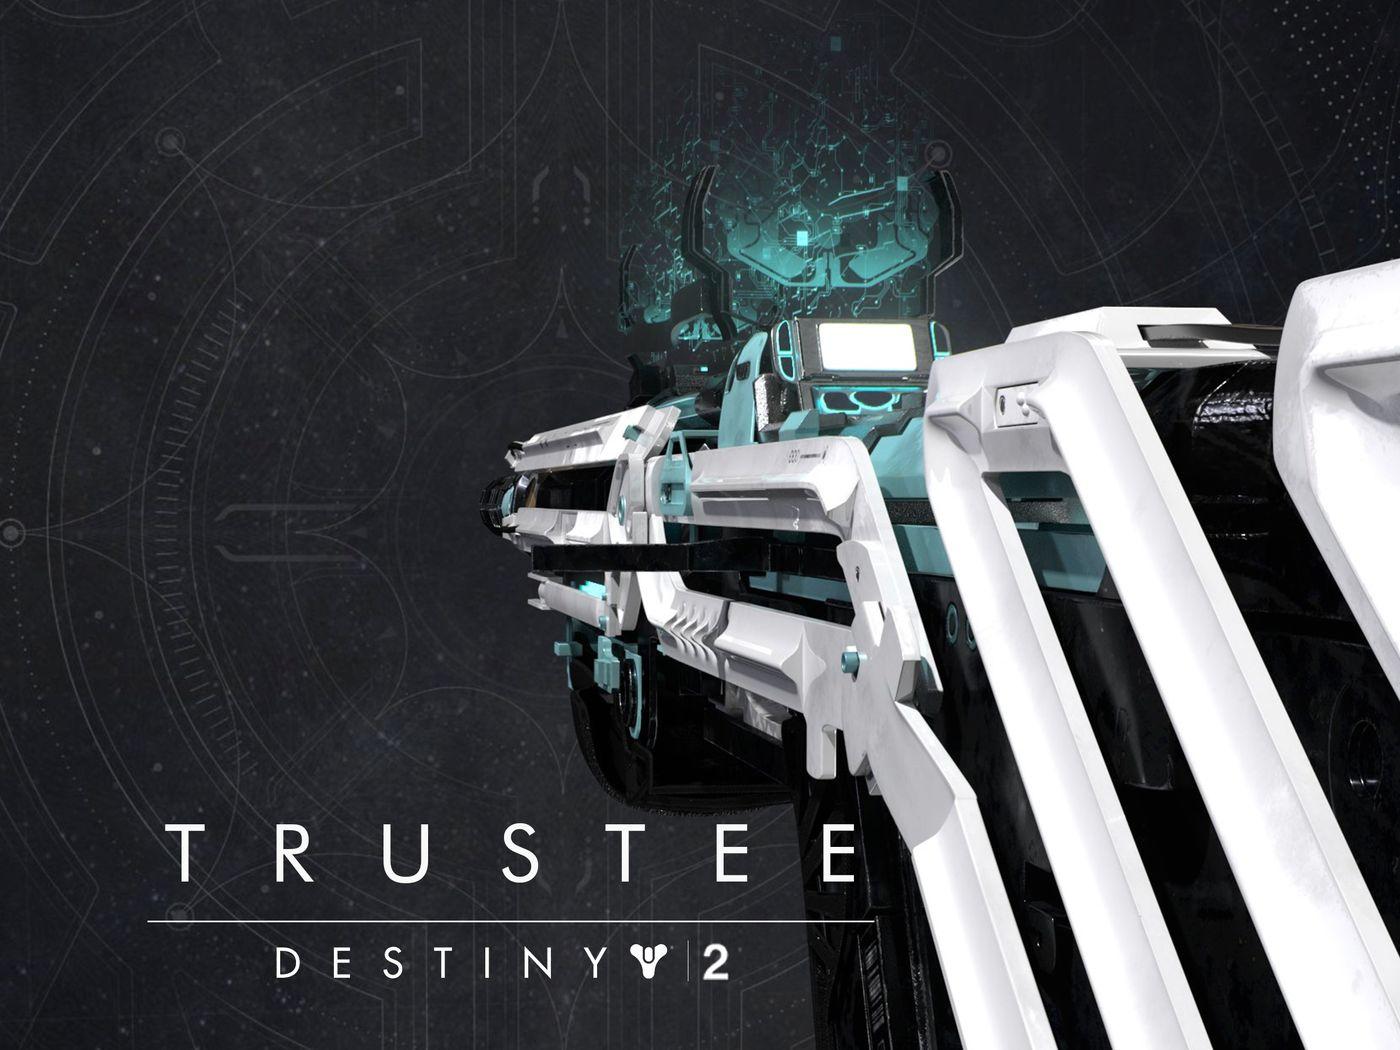 Destiny 2   Trustee Scout Rifle